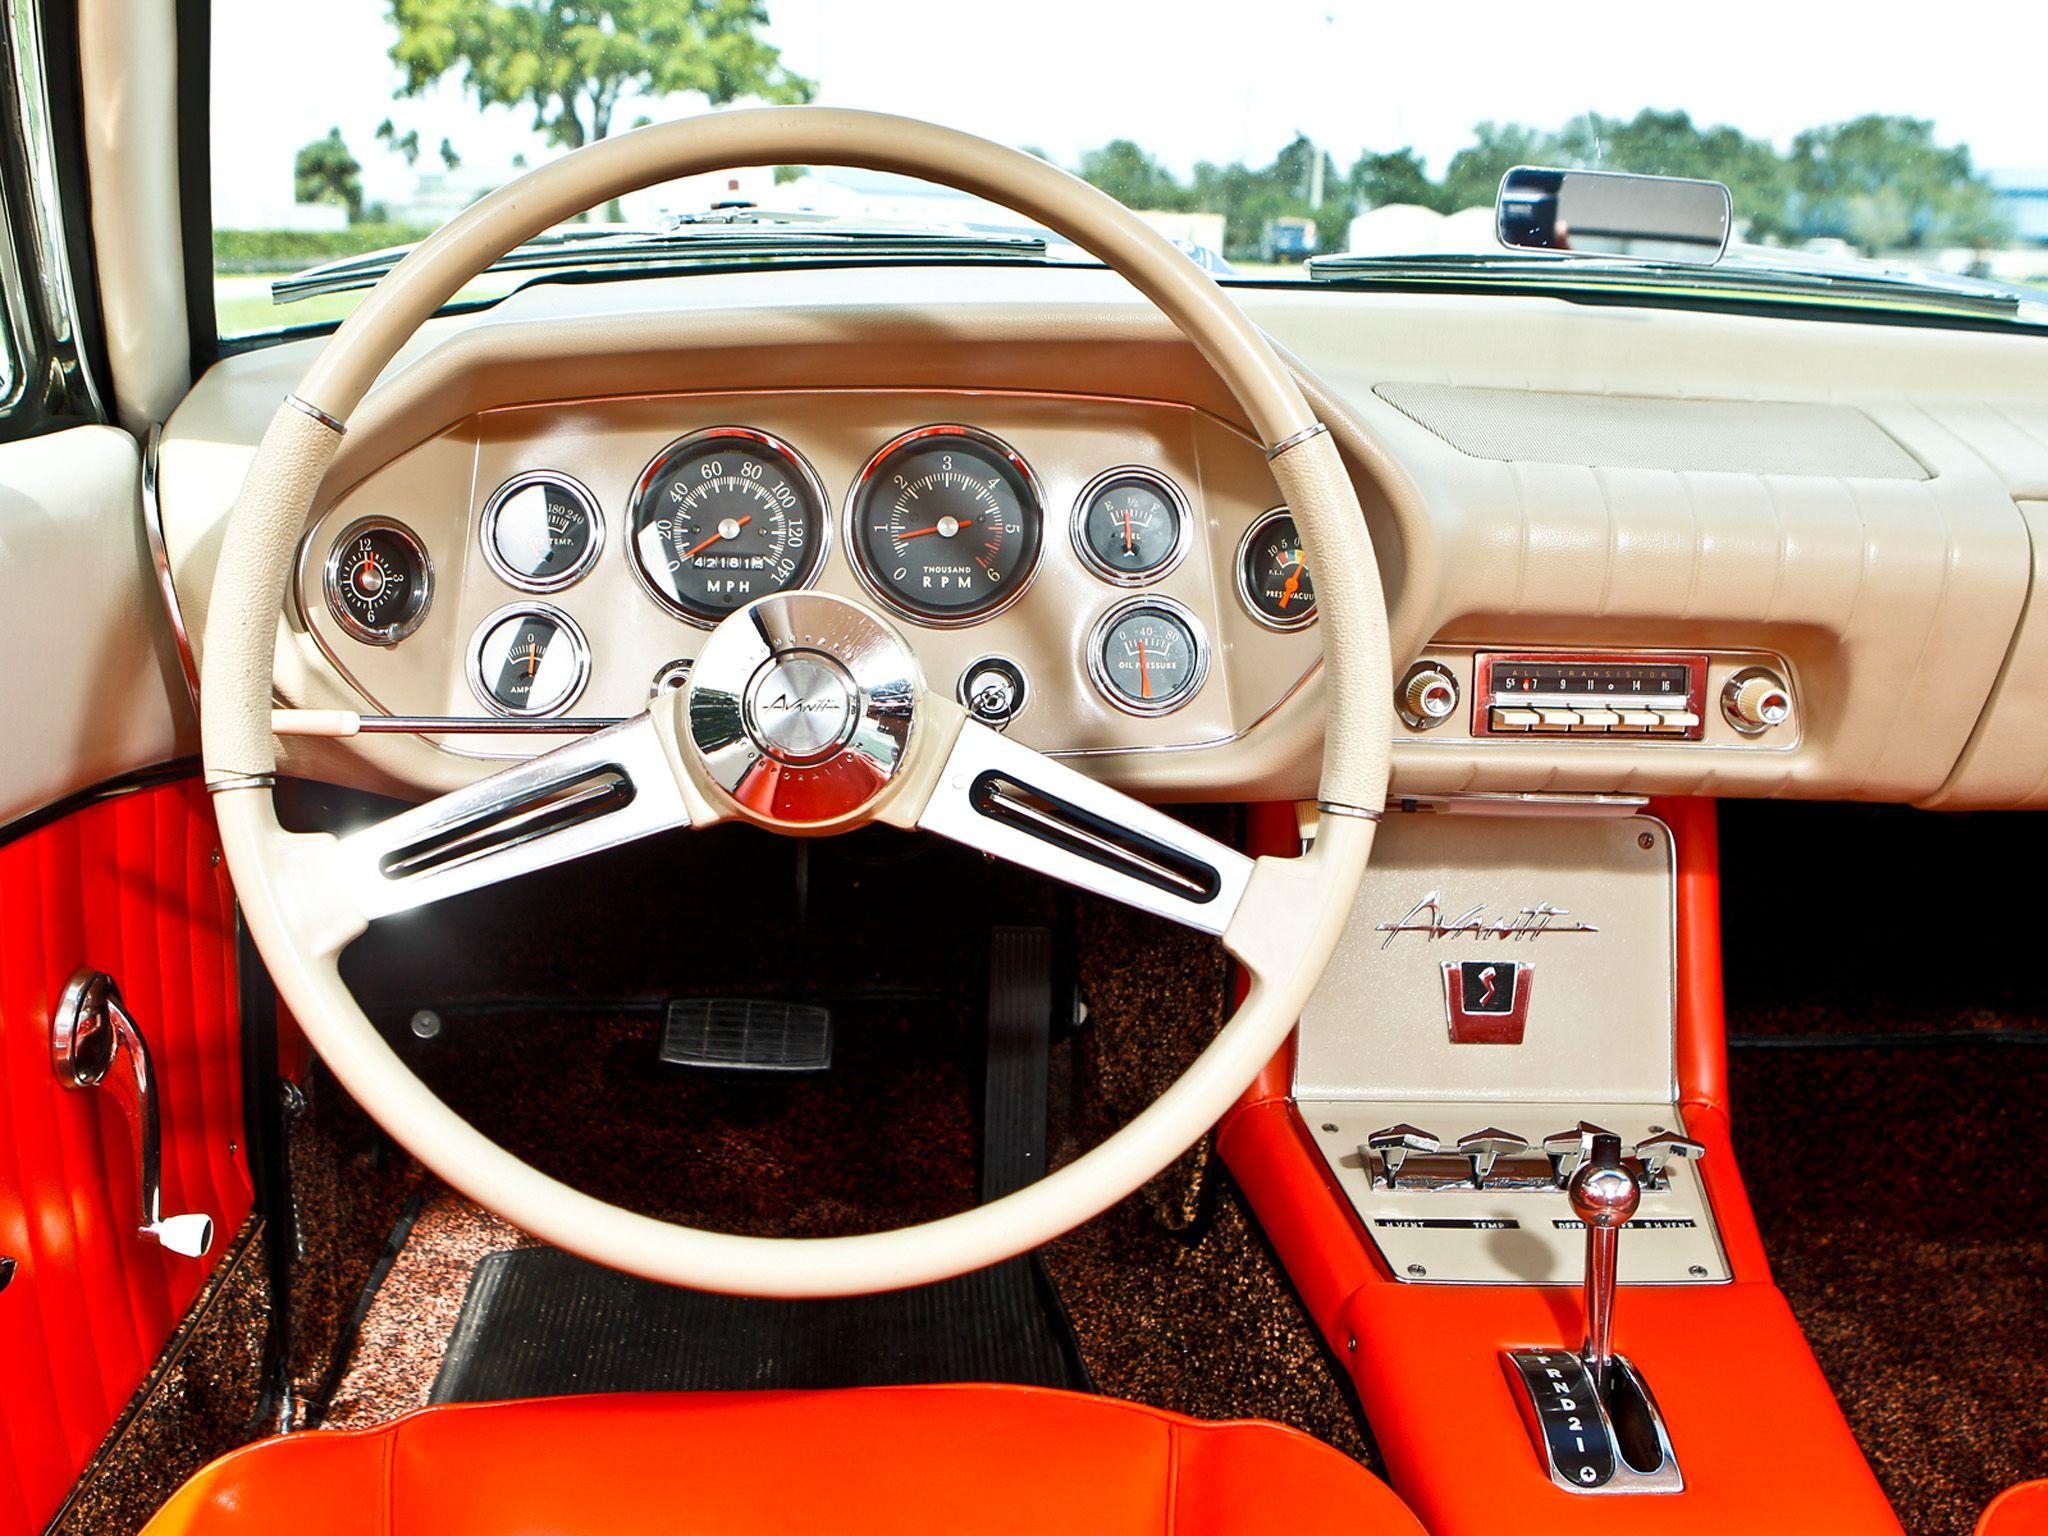 1963 studebaker avanti classic interior f wallpaper 2048x1536 114460 wallpaperup